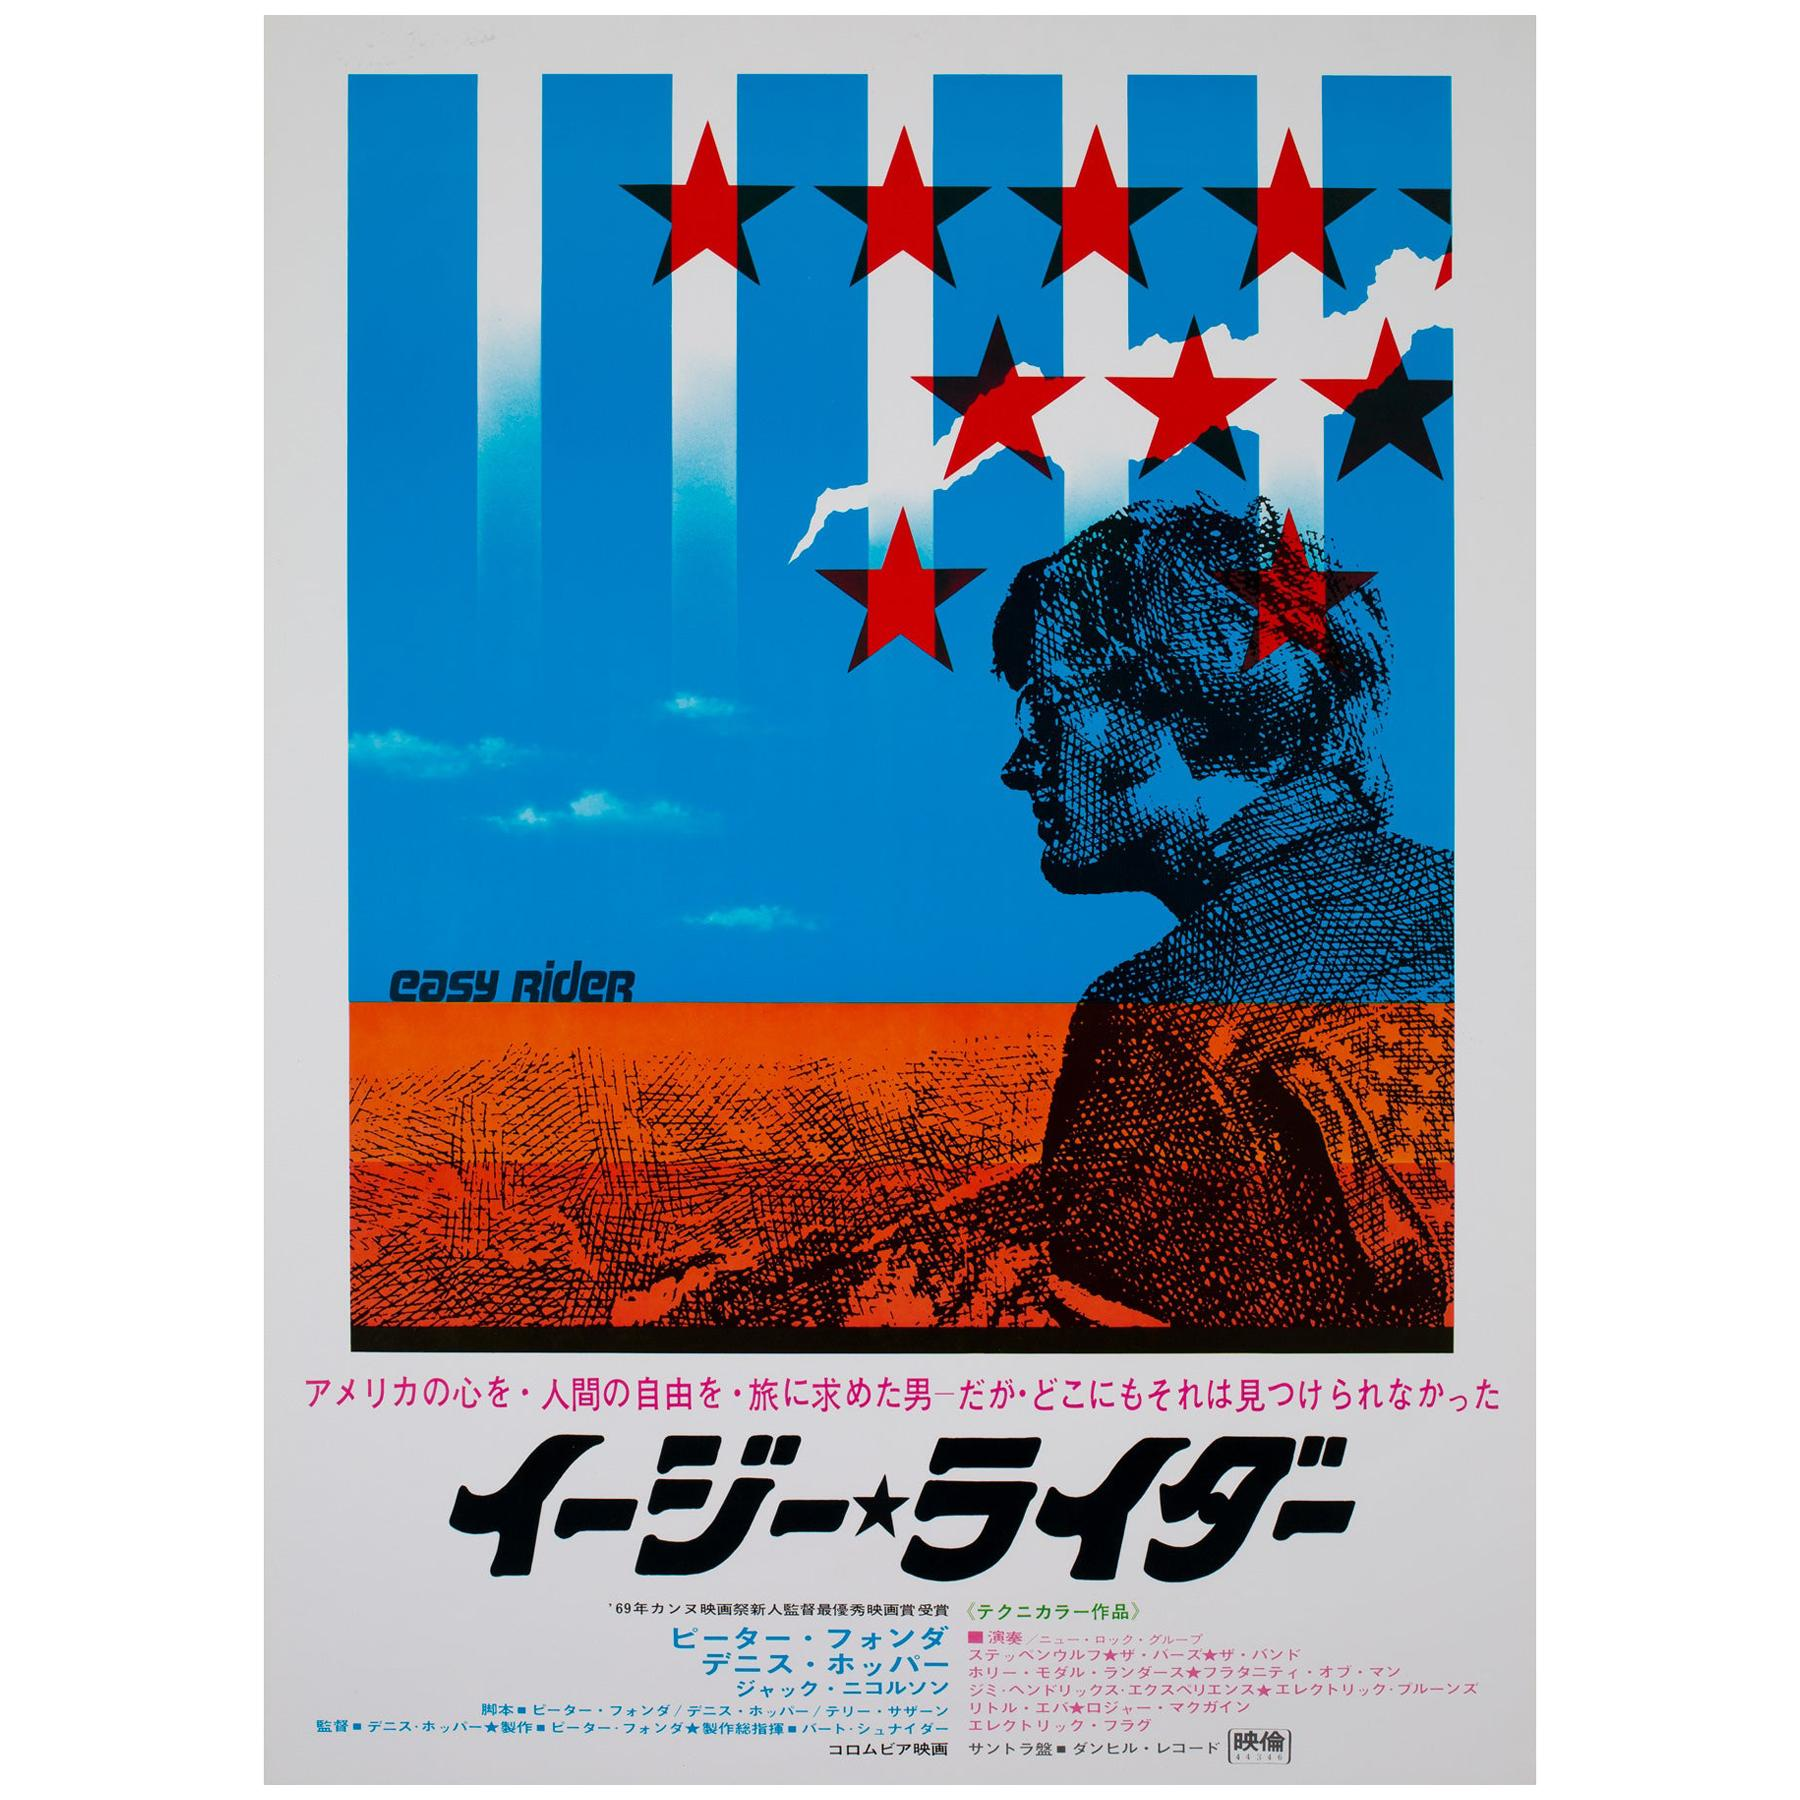 Easy Rider Original Japanese Film Movie Poster, 1969